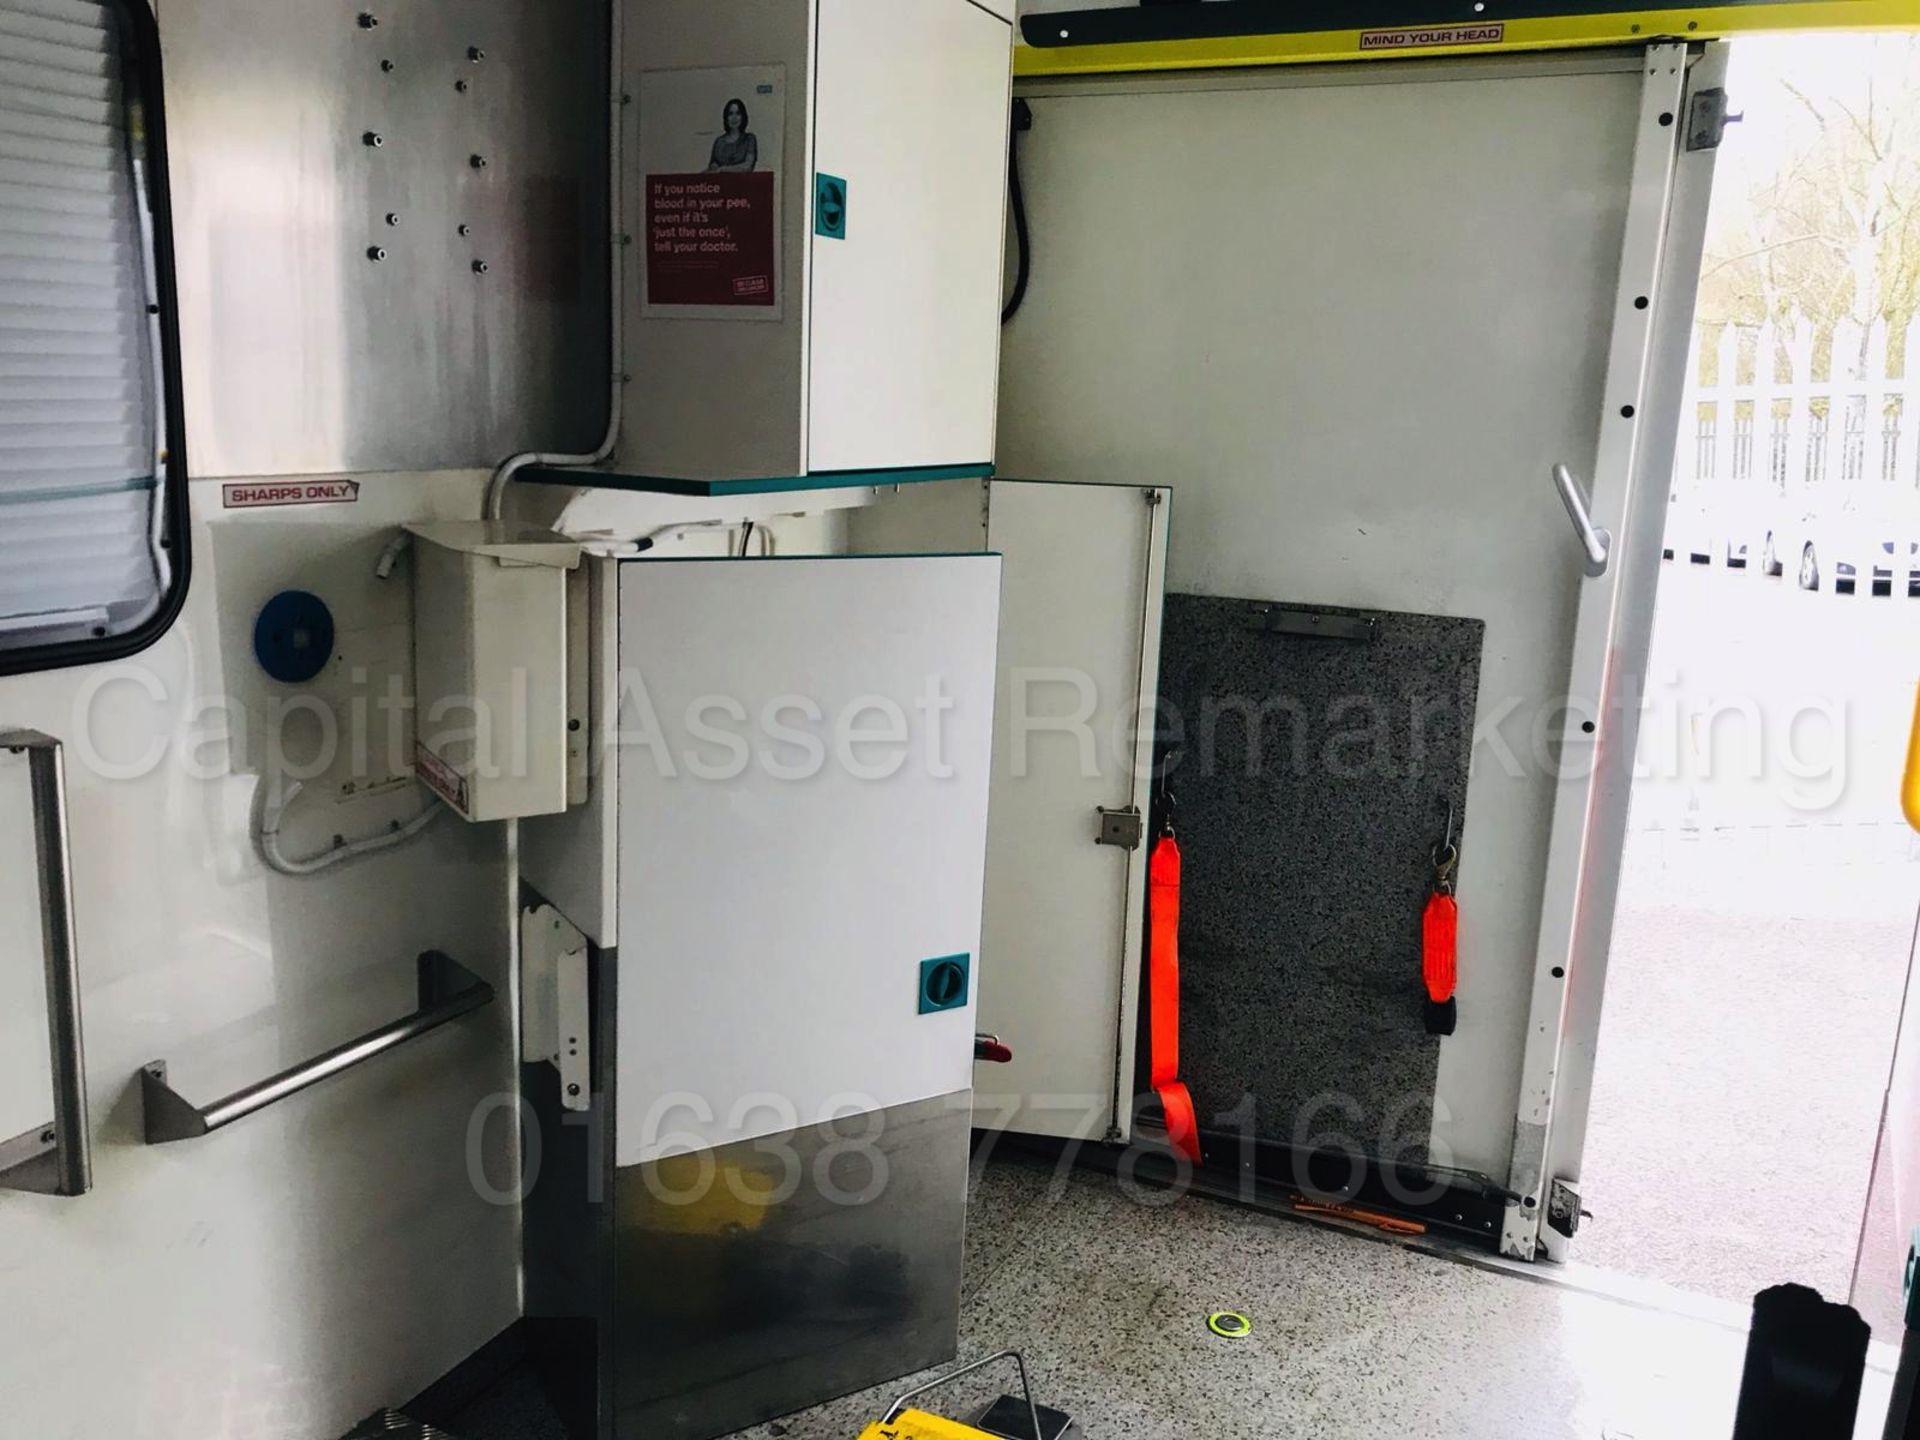 Lot 37 - MERCEDES-BENZ SPRINTER 519 CDI *AMBULANCE / BOX VAN* (2010) '3.0 DIESEL - 190 BHP - AUTOMATIC' *A/C*